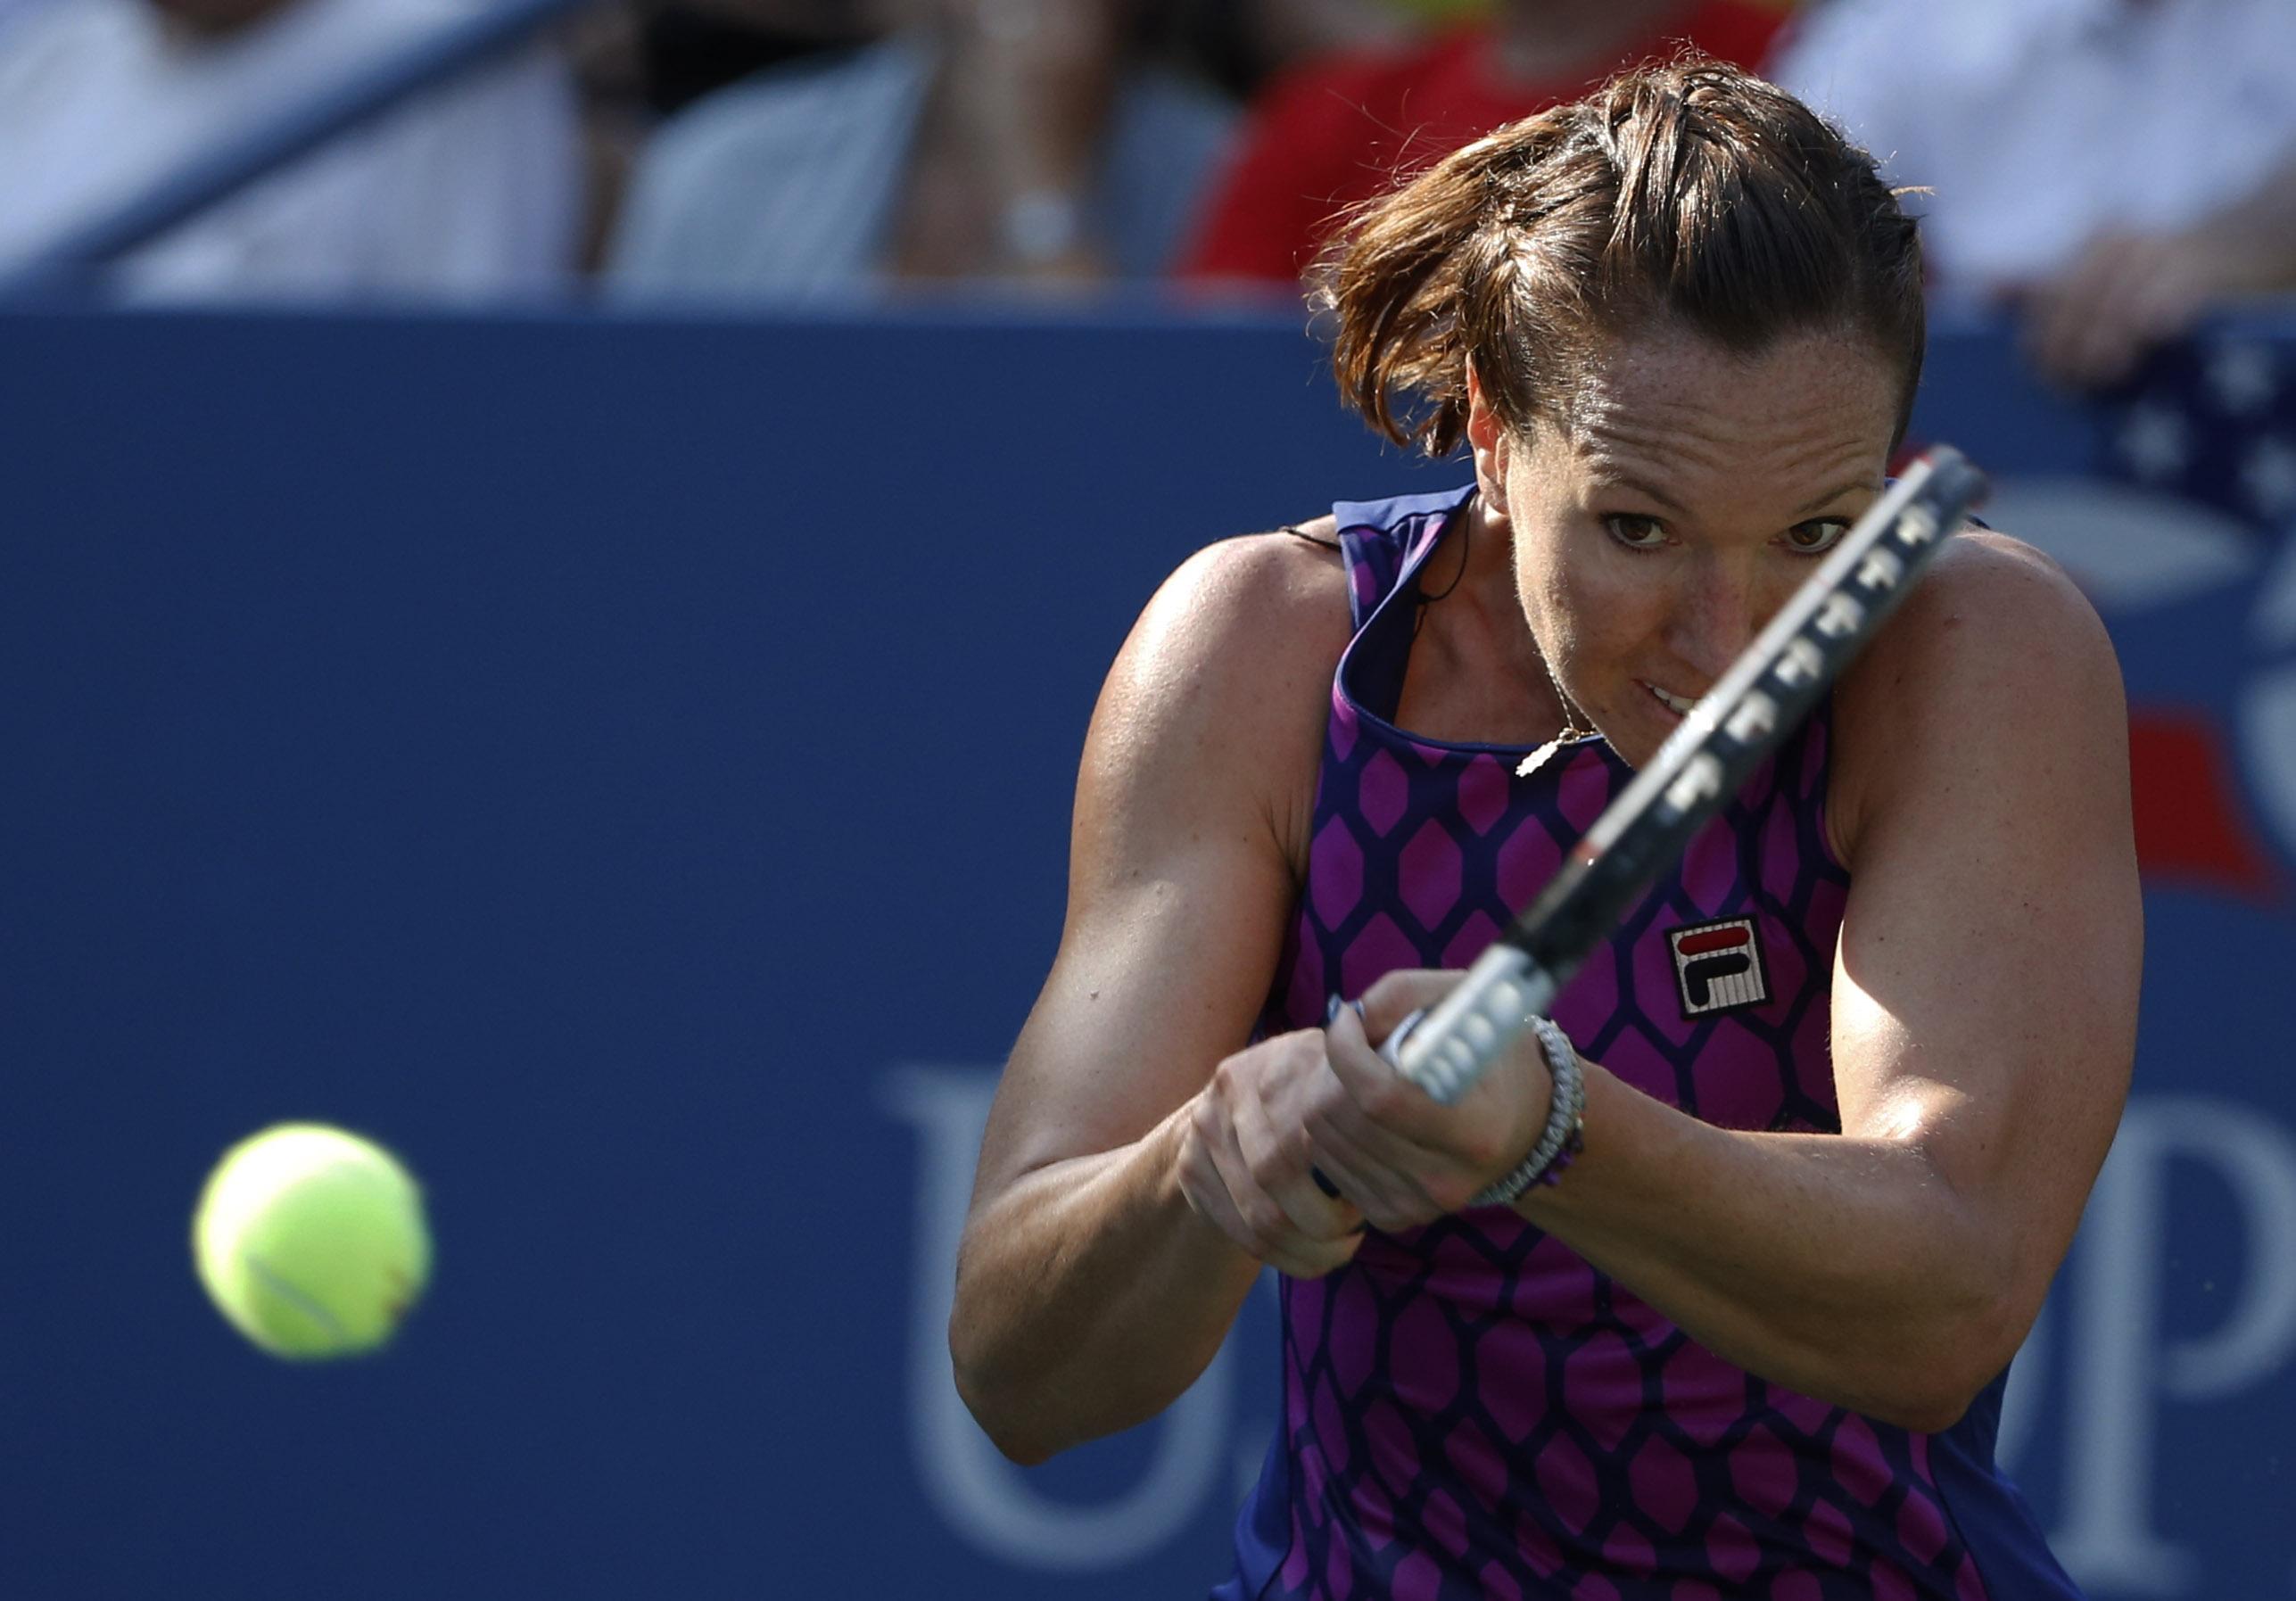 Jelena Jankovic, of Serbia, returns a shot against Tsvetana Pironkova, of Bulgaria, during the second round of the 2014 U.S. Open tennis tournament, Wednesday, Aug. 27, 2014, in New York